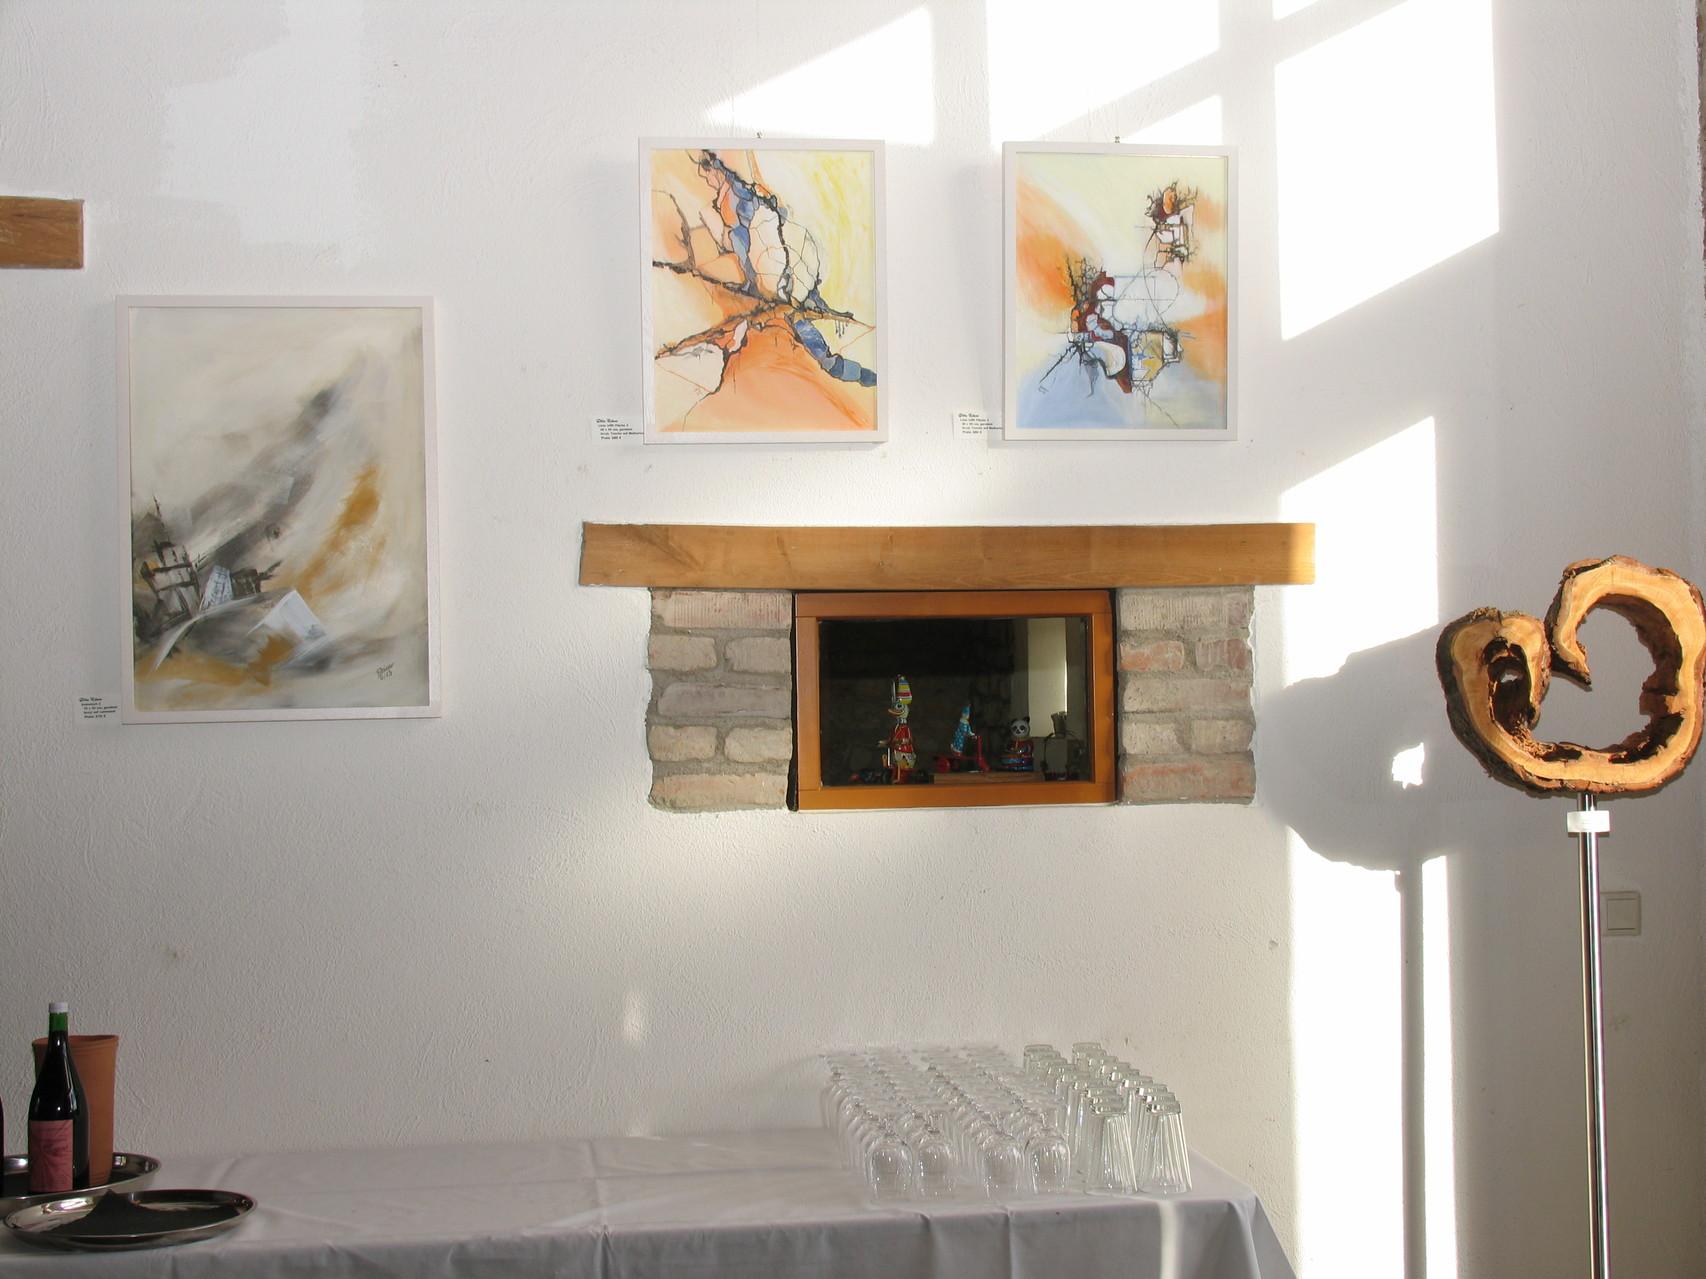 Bilder am Eingang